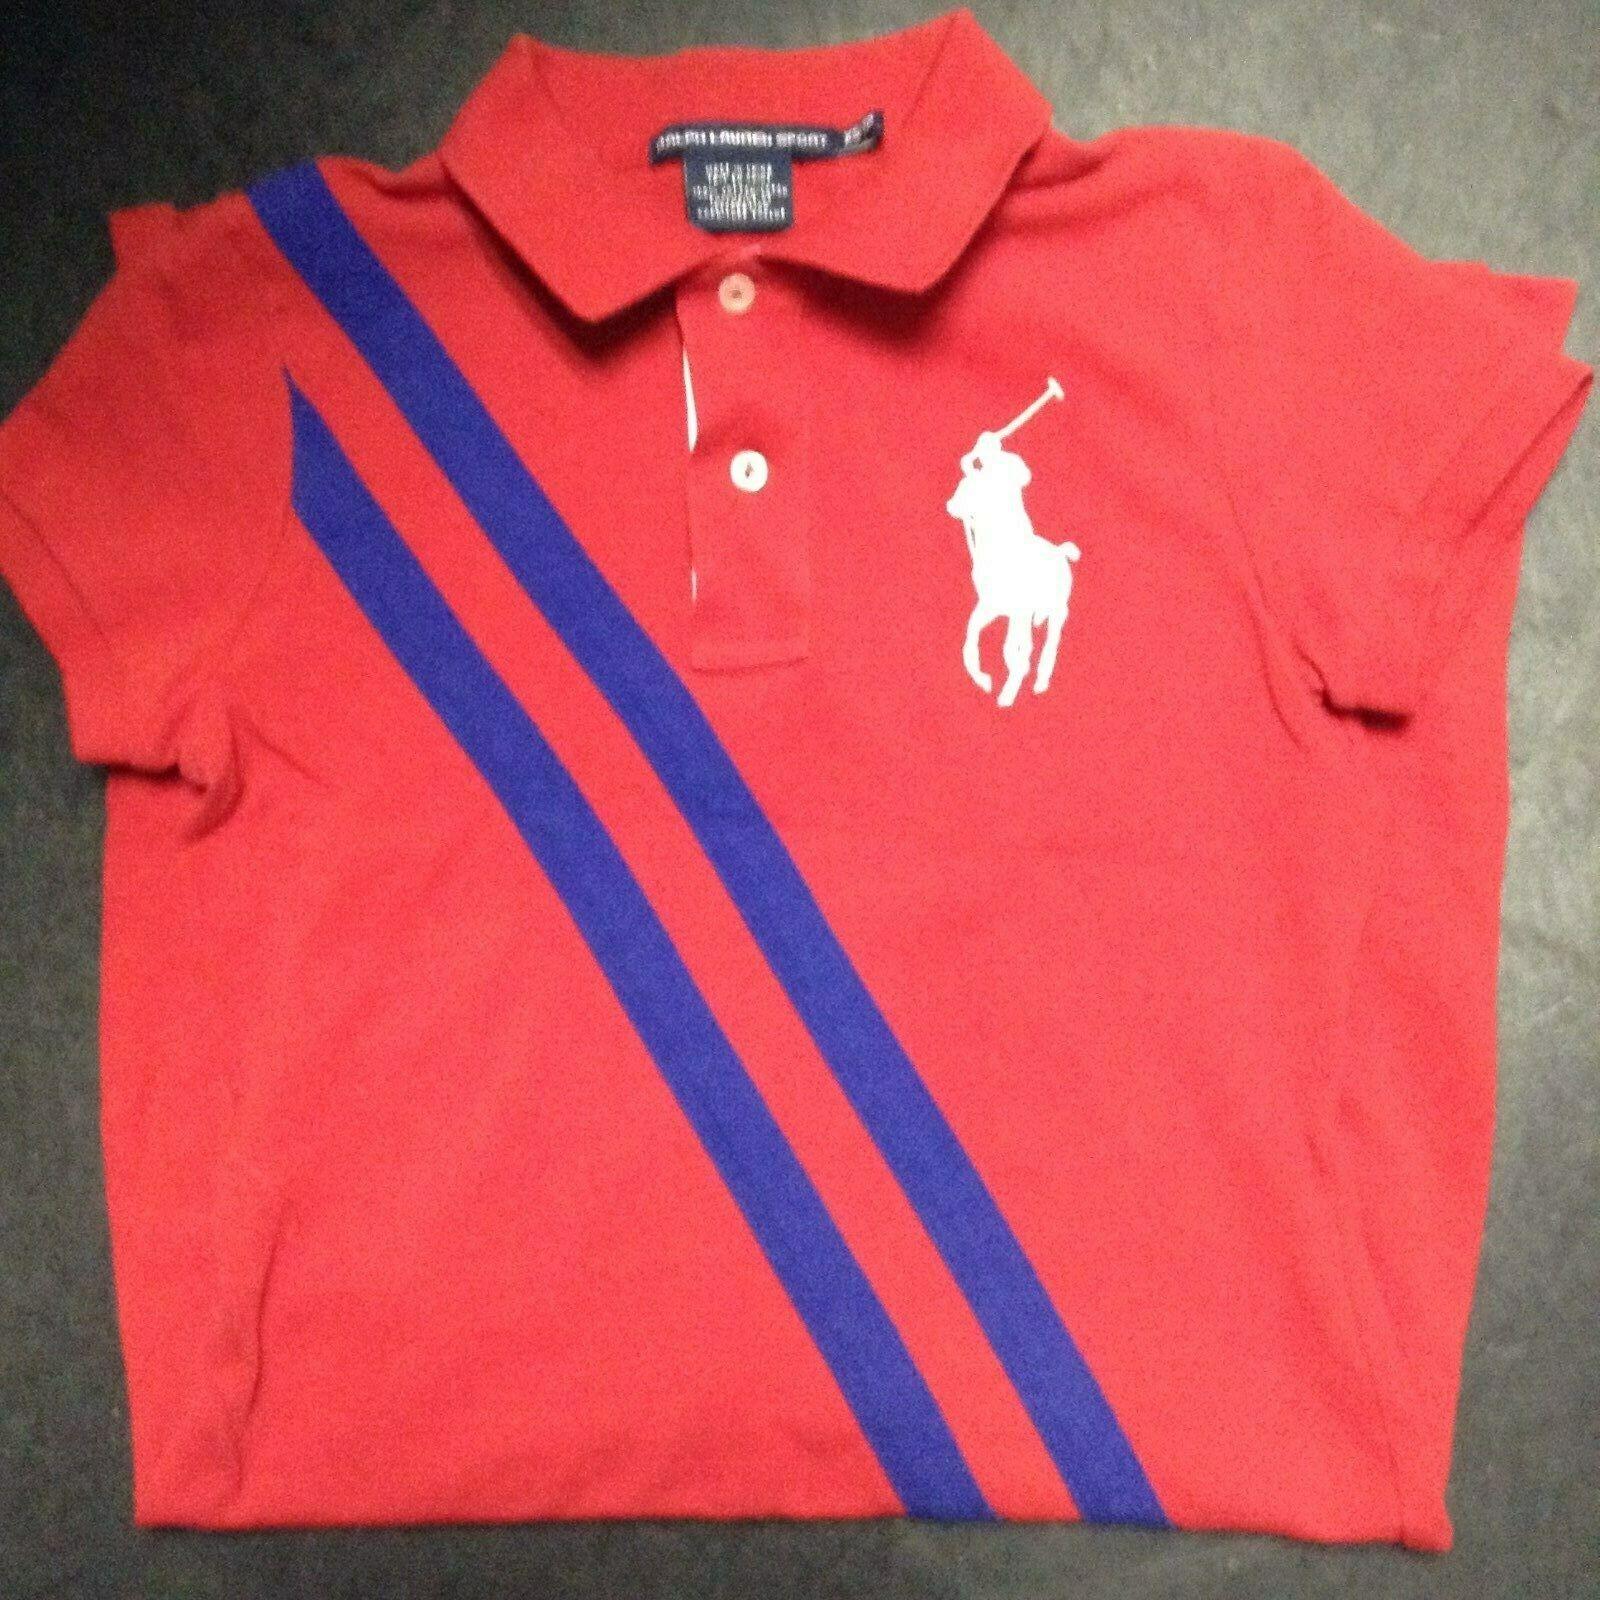 NWOT Polo Ralph Lauren sport damen rot Blau MULTI MESH DRESS Größe XS